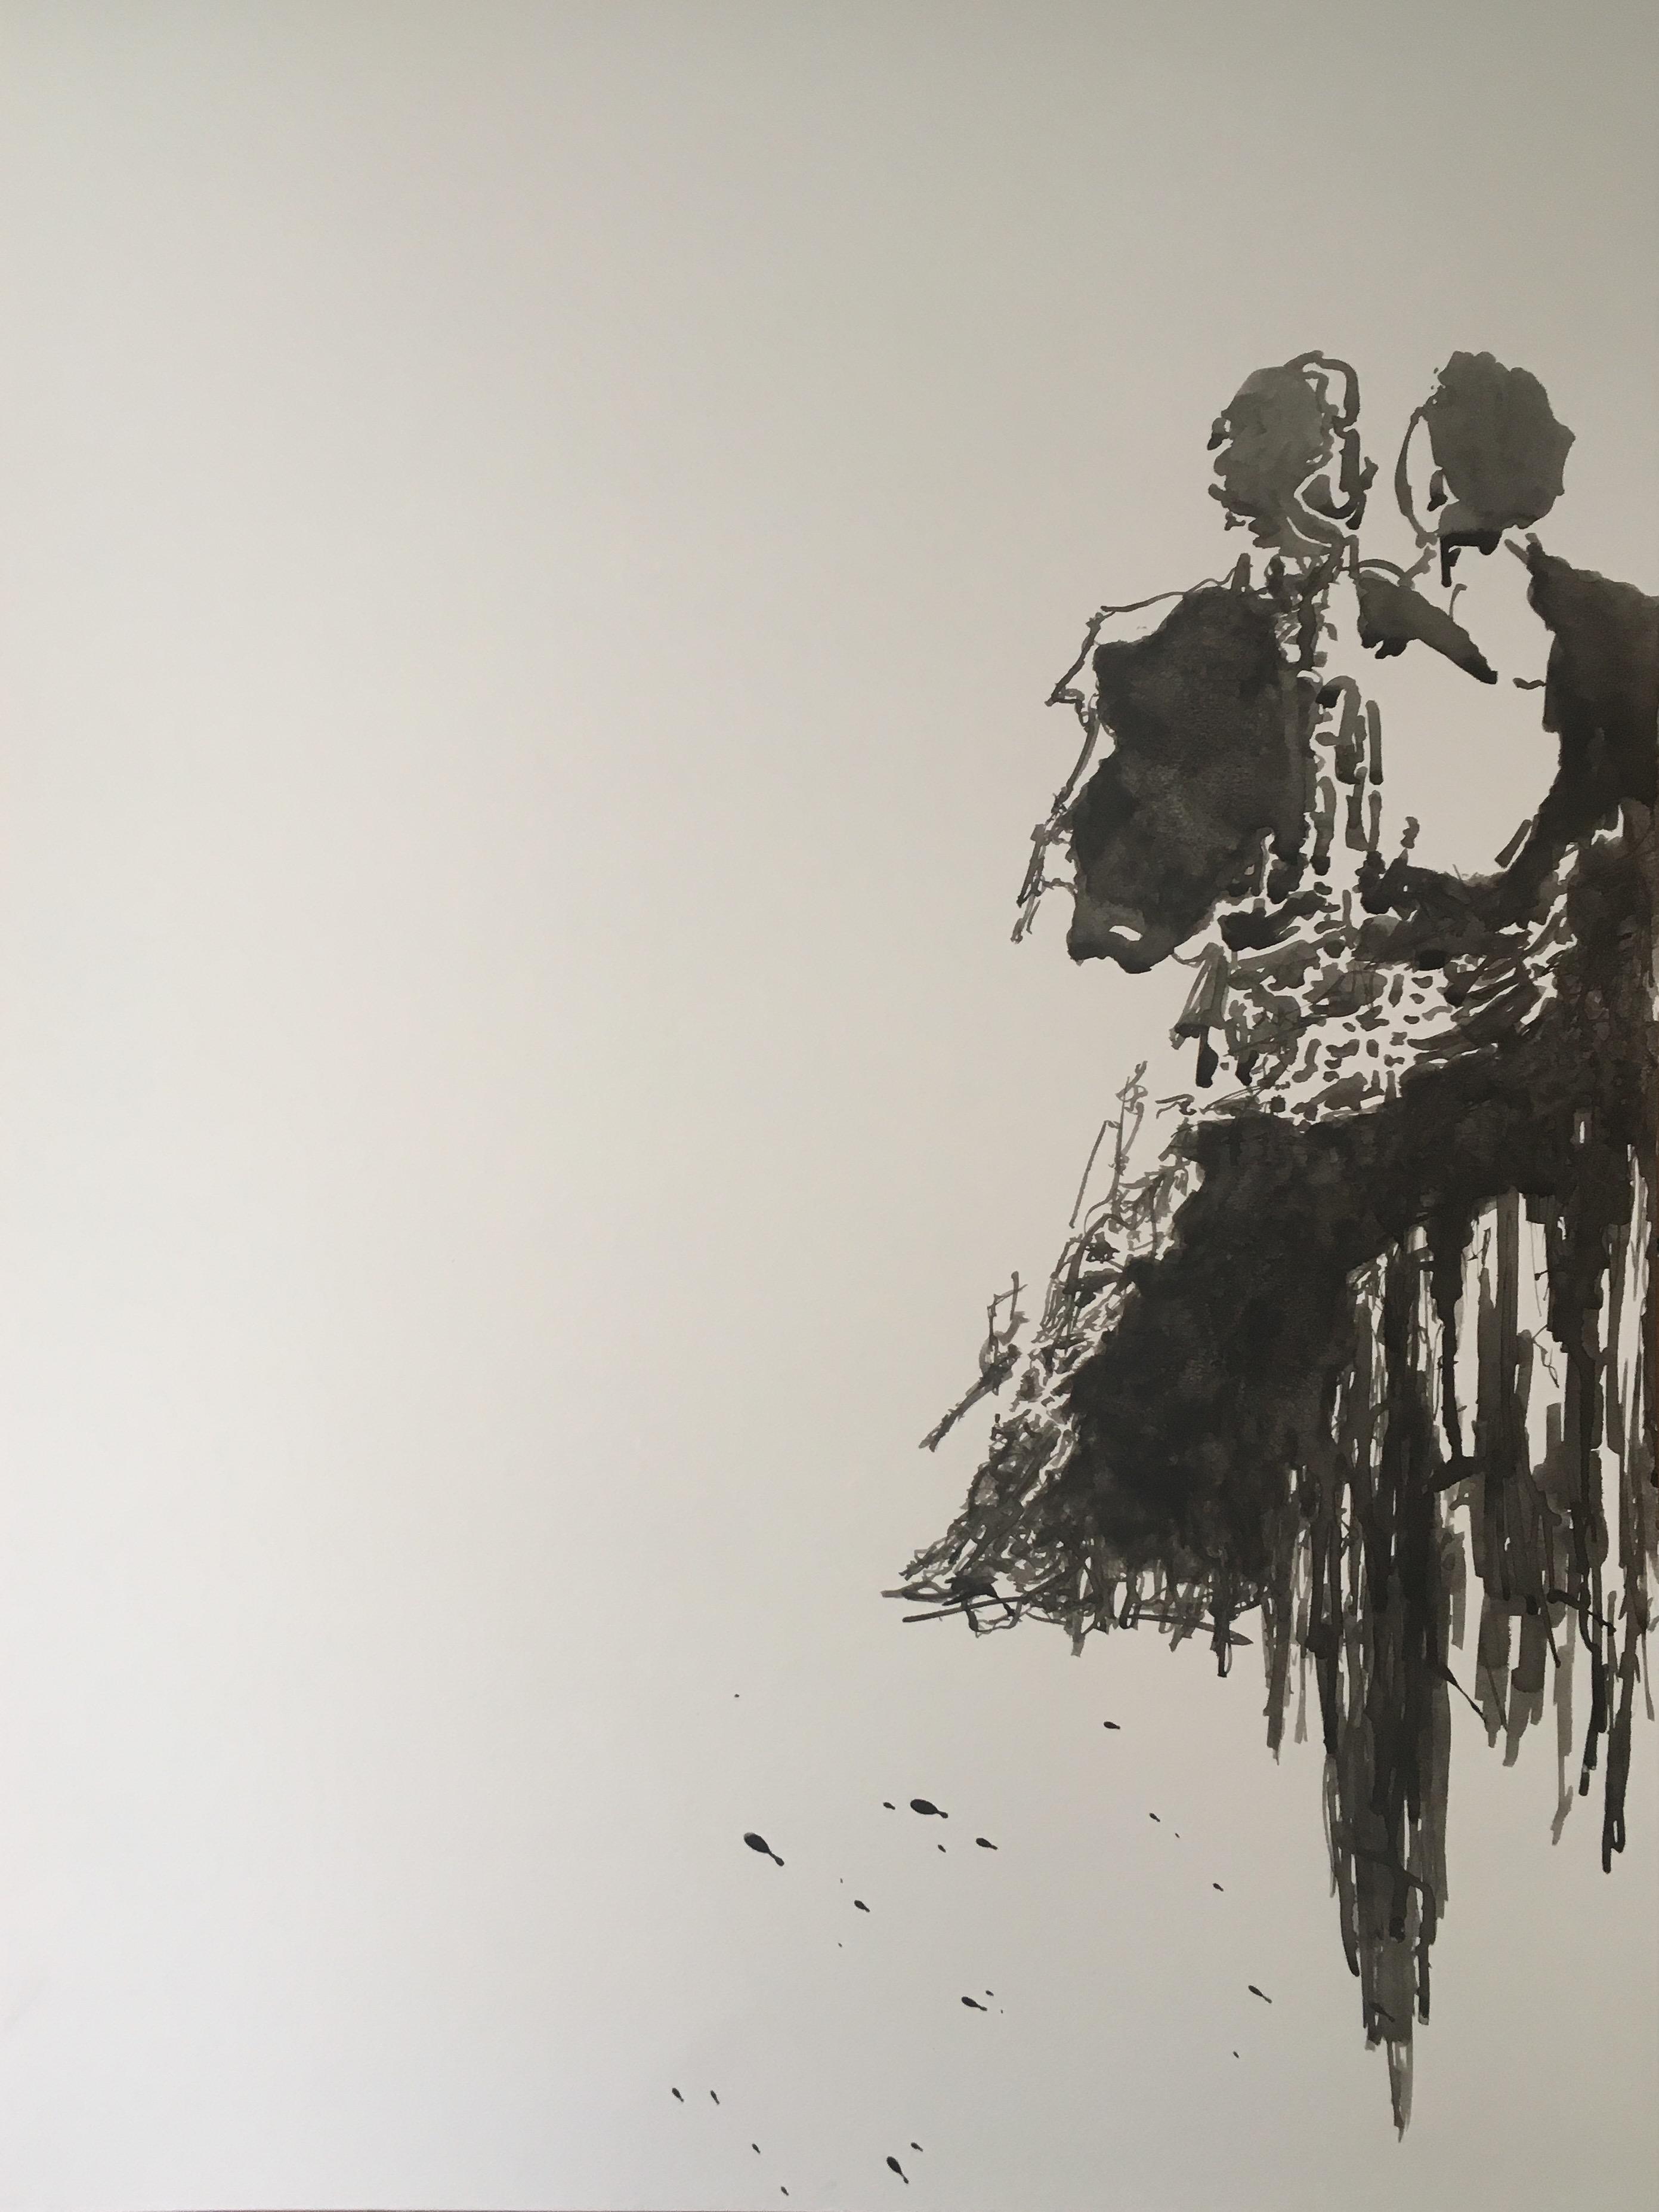 Untitled 3 - Farzad Kohan